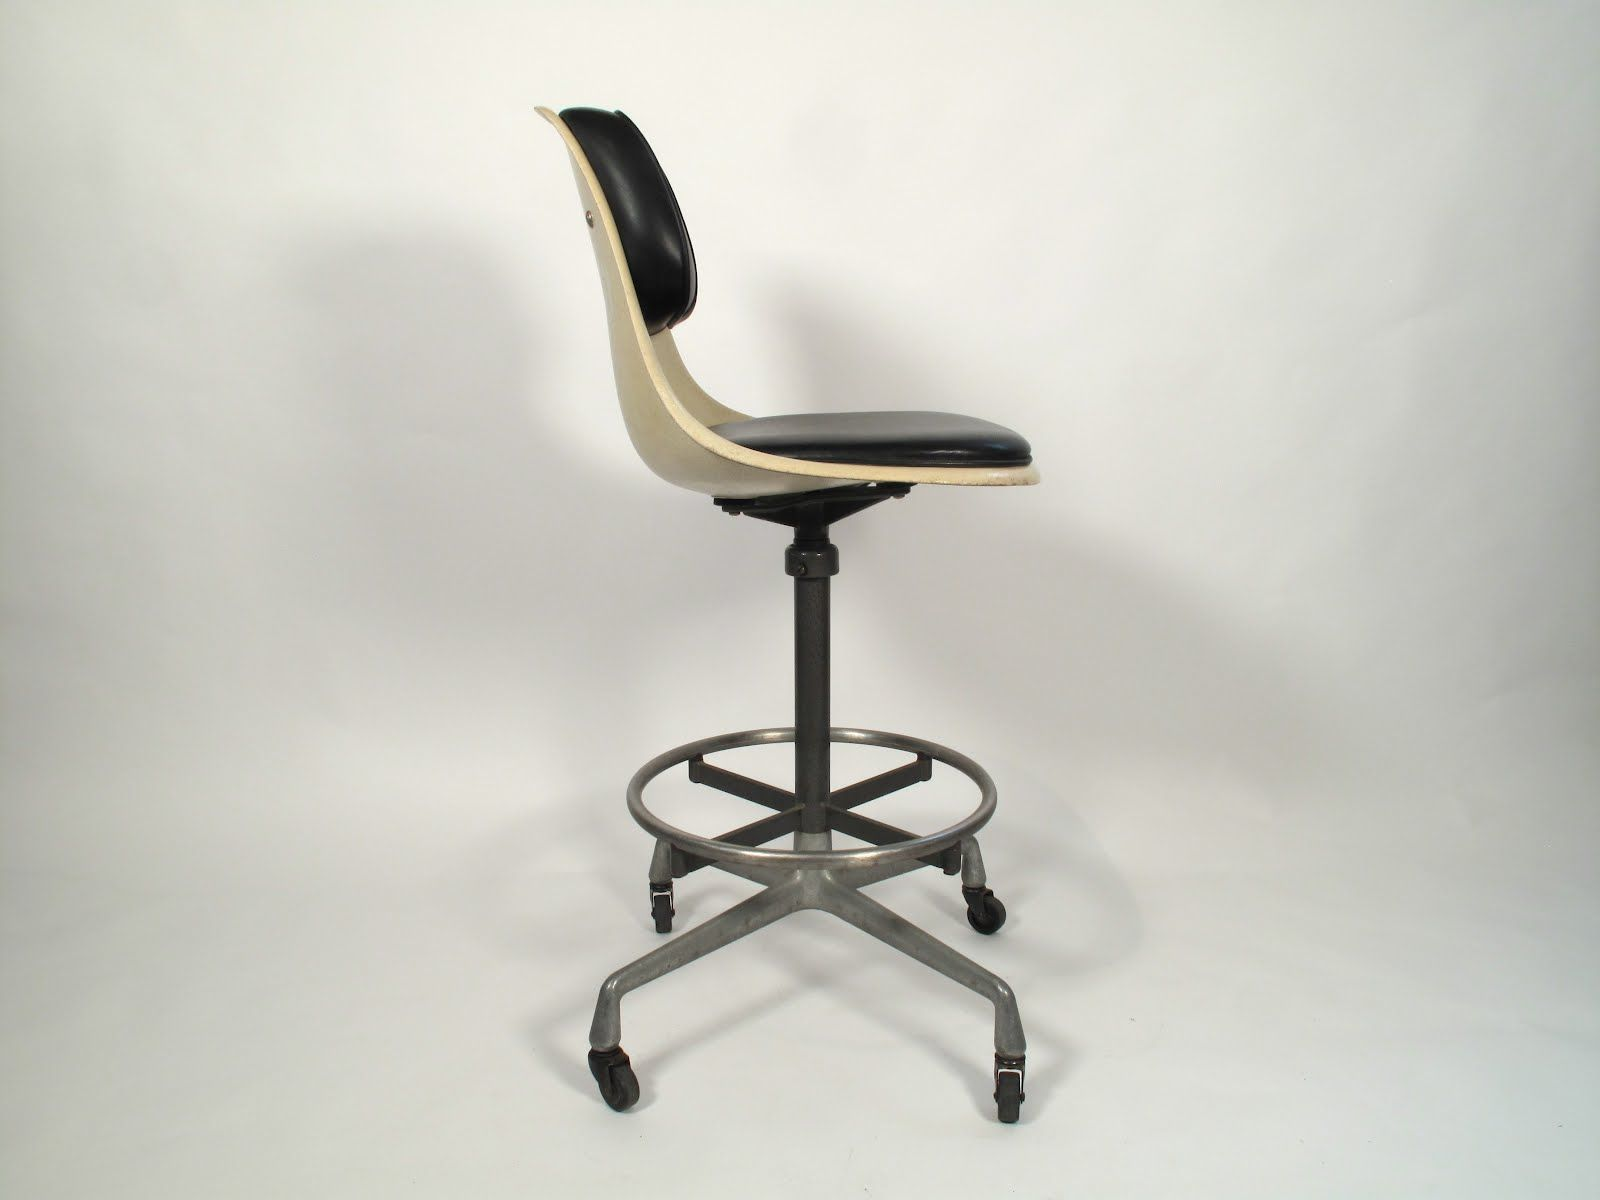 modern drafting chair adirondack chairs maine eames for archaic austin studio space